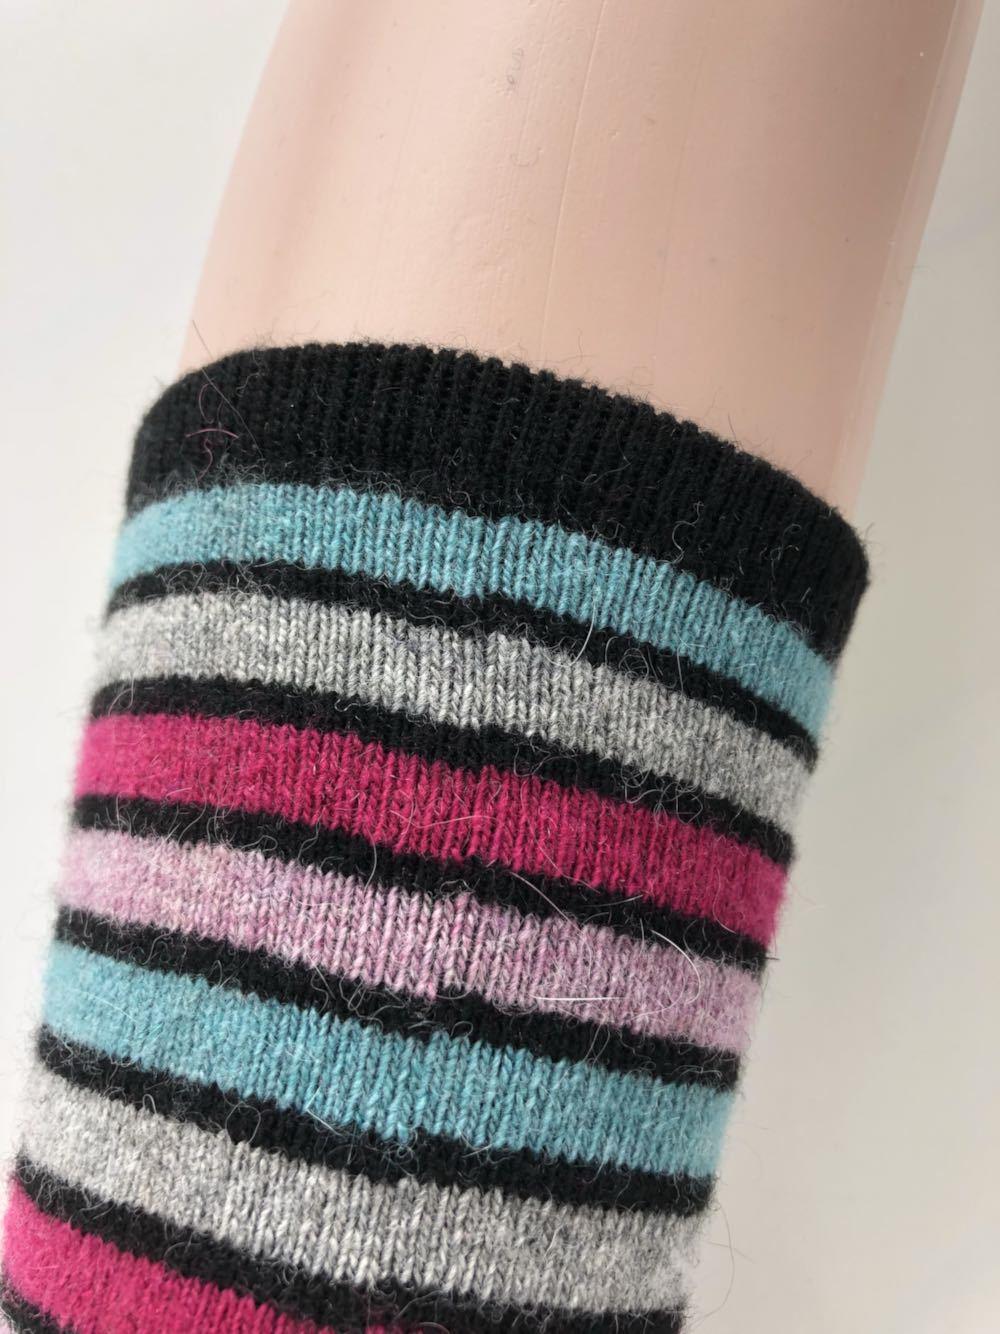 Hot Sale Over Knee Long Tube Rabbit Wool Knitted Leg Warmer Boots Gaiters Rainbow Fashion Feminine Winter Leg Cover 1pair Drop Shipping Underwear & Sleepwears